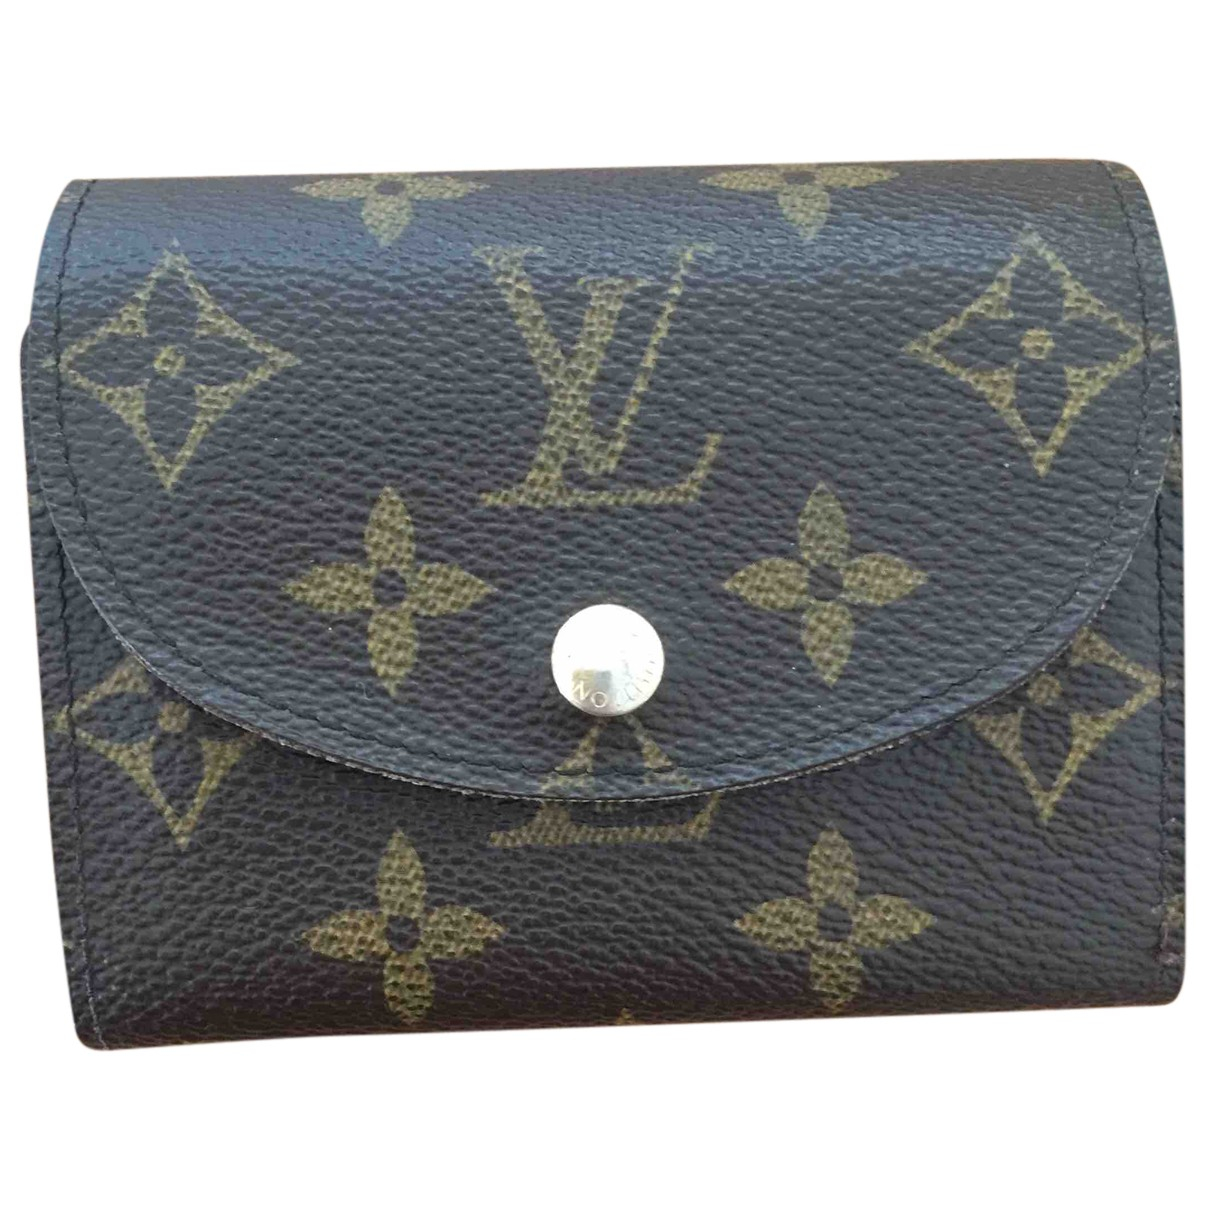 Louis Vuitton Rosalie Brown Cloth Purses, wallet & cases for Women N